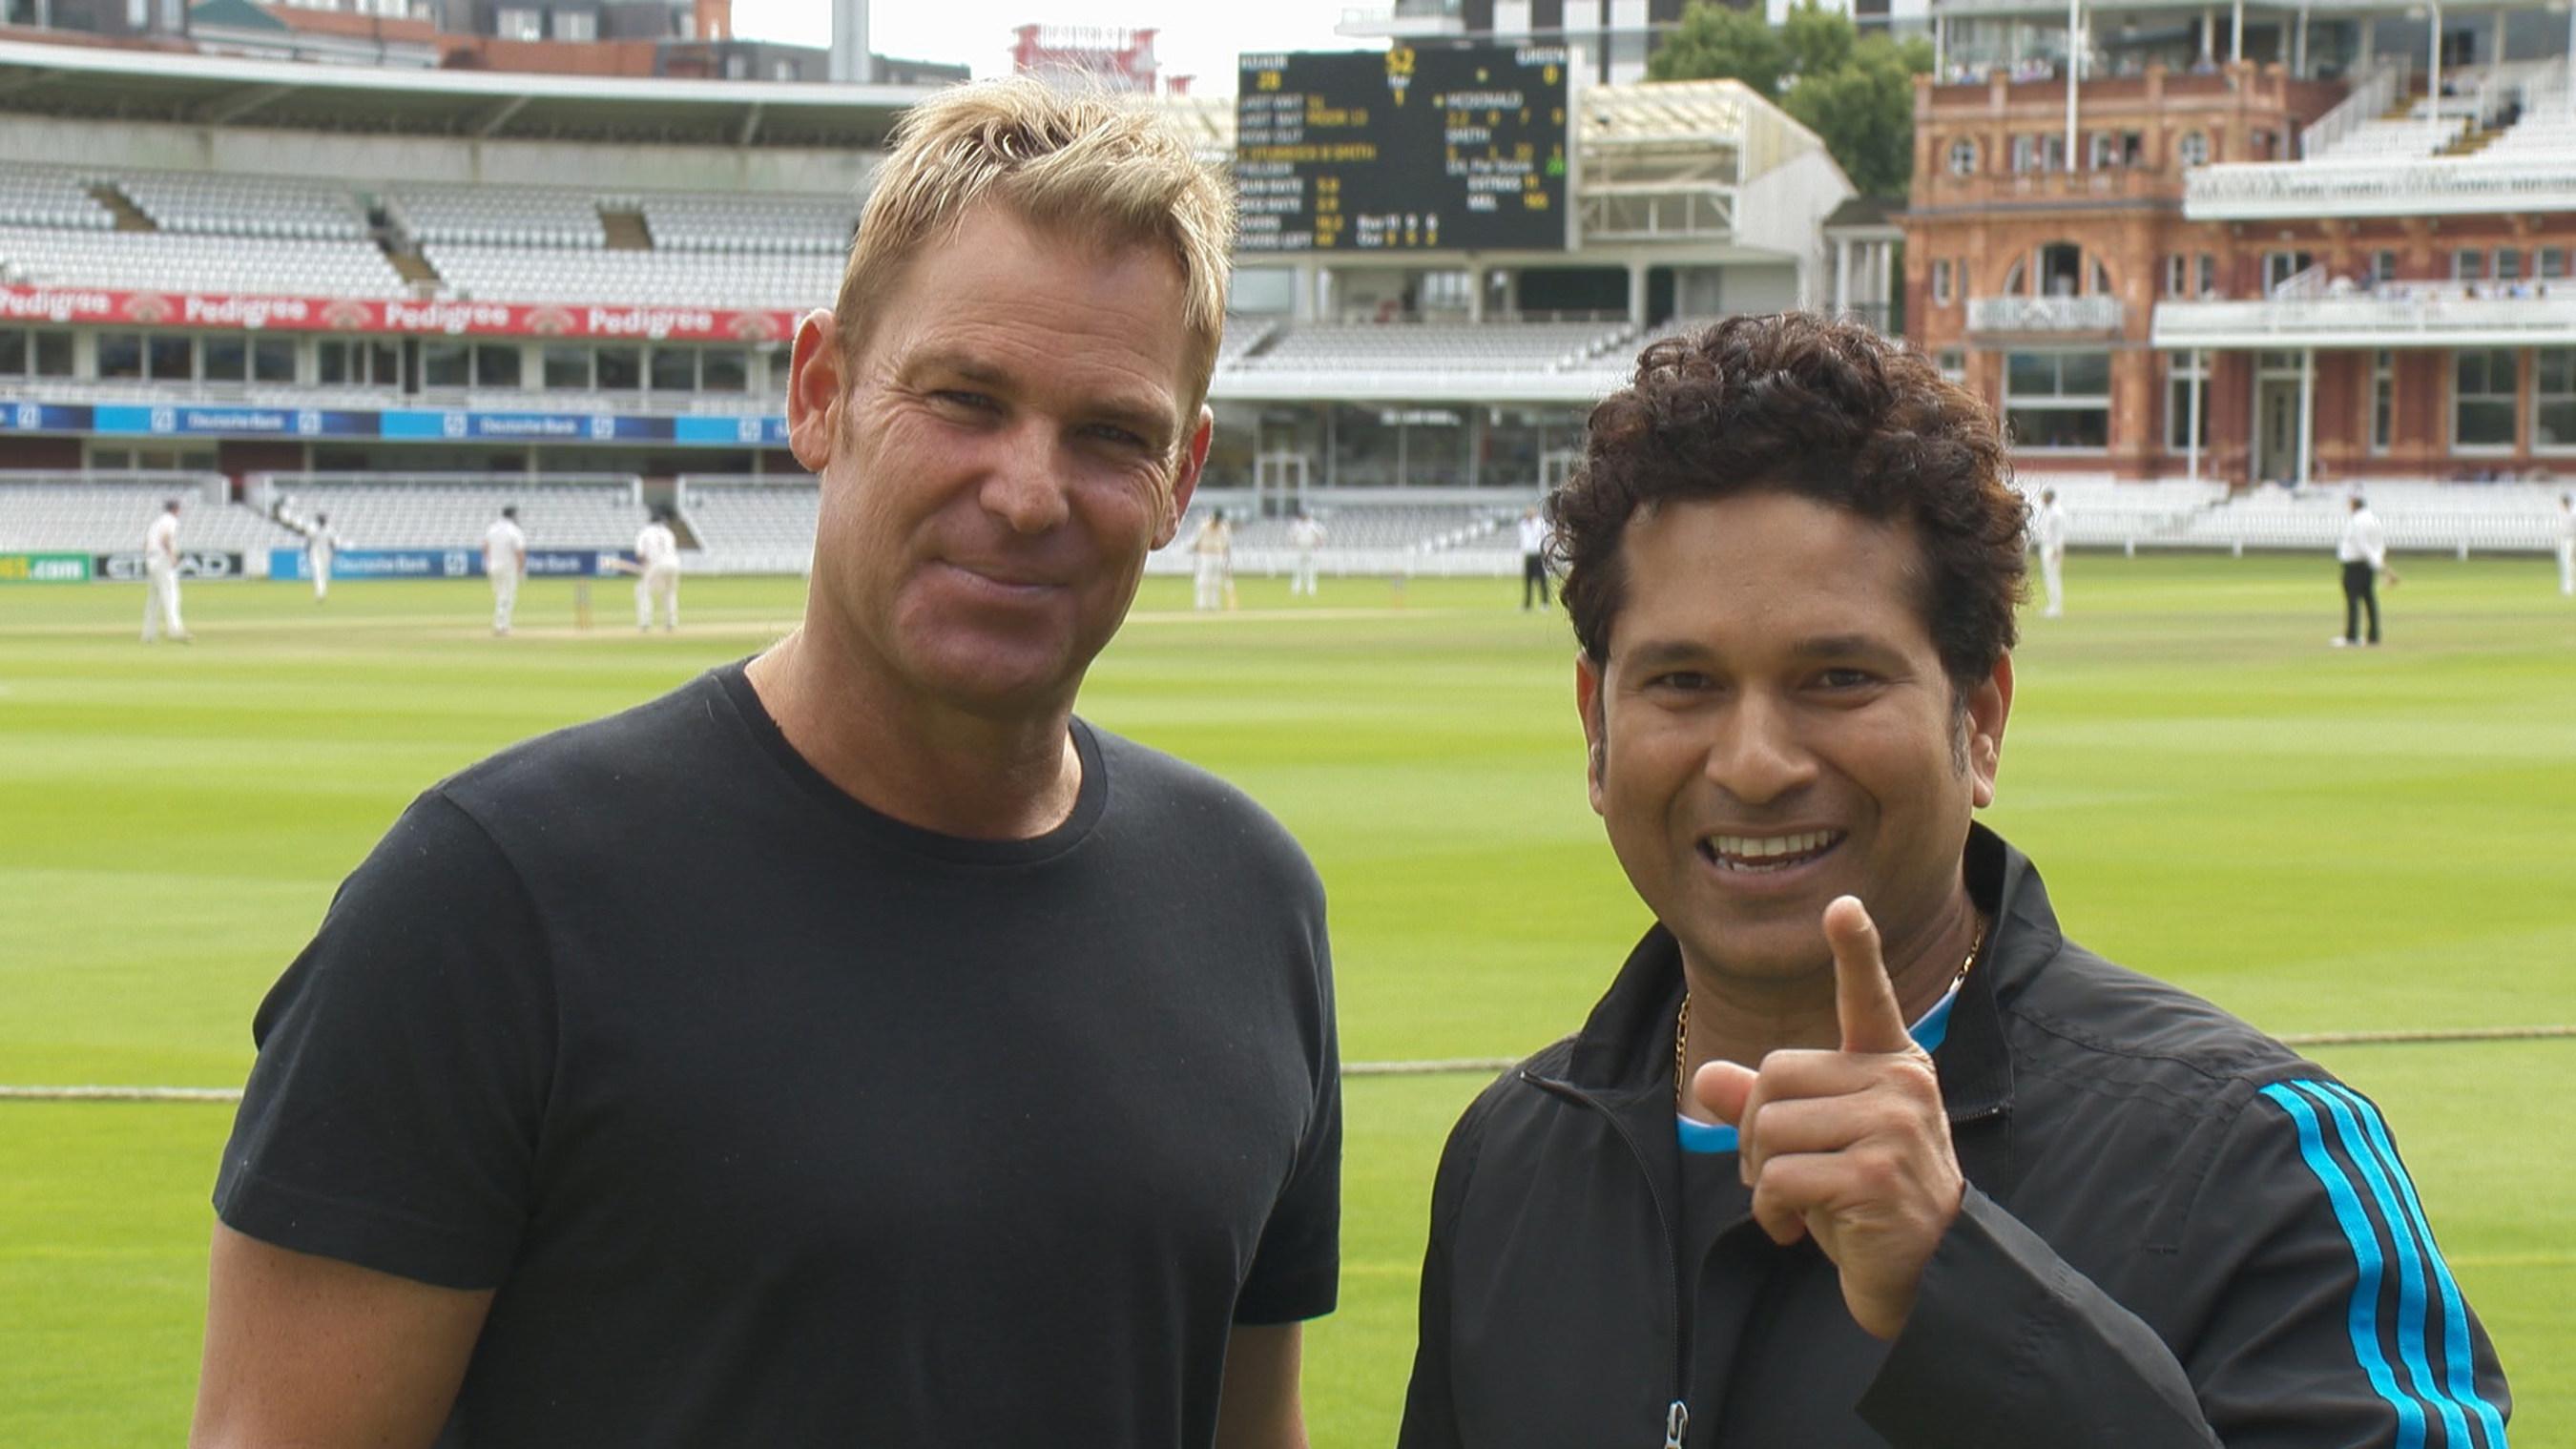 Shane Warne (left) and Sachin Tendulkar (right)